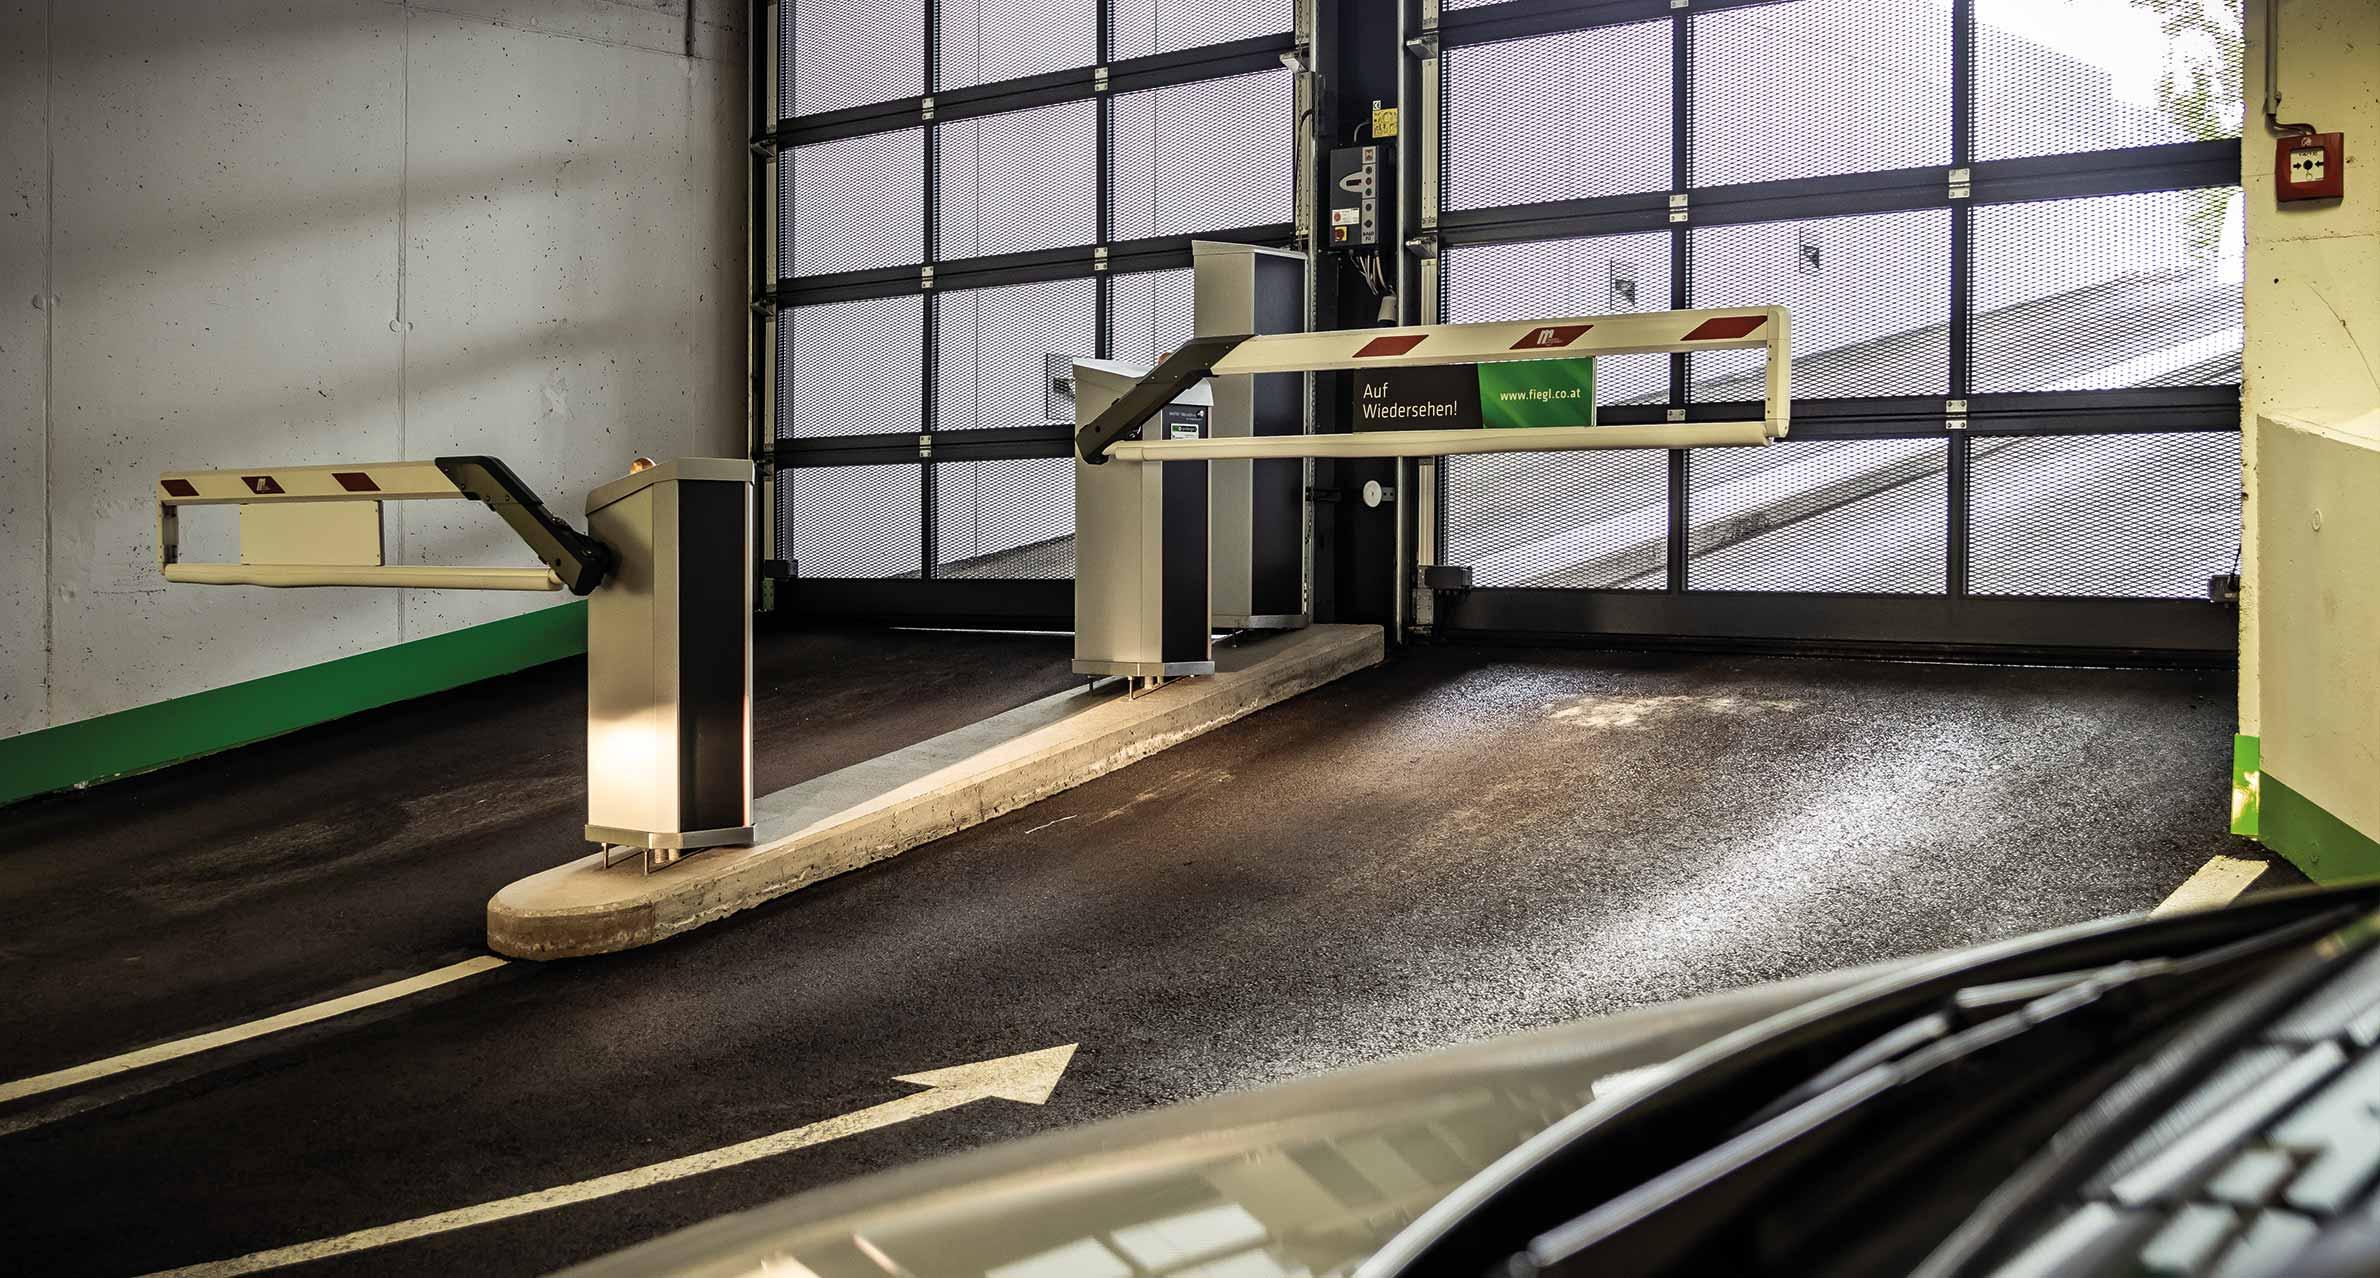 Automatischer Schranken in Tiefgarage